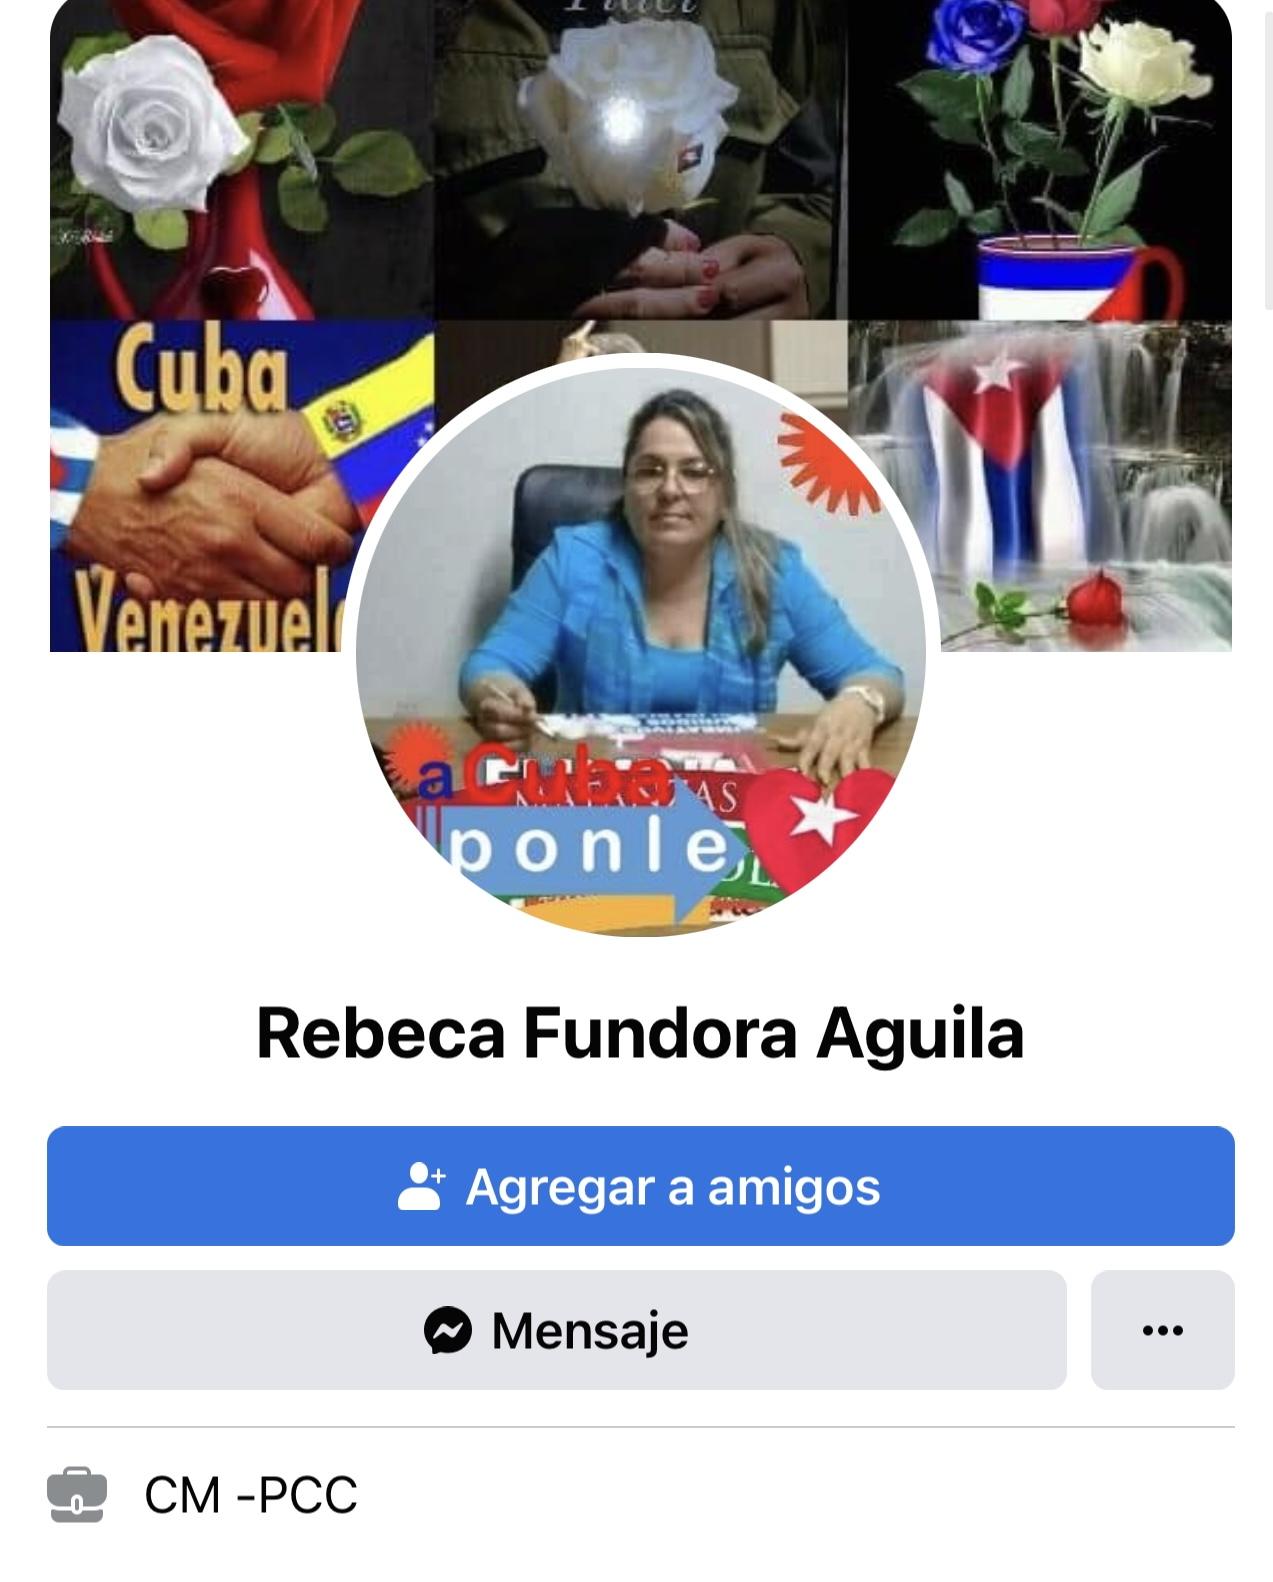 Rebeca Fundora Aguila